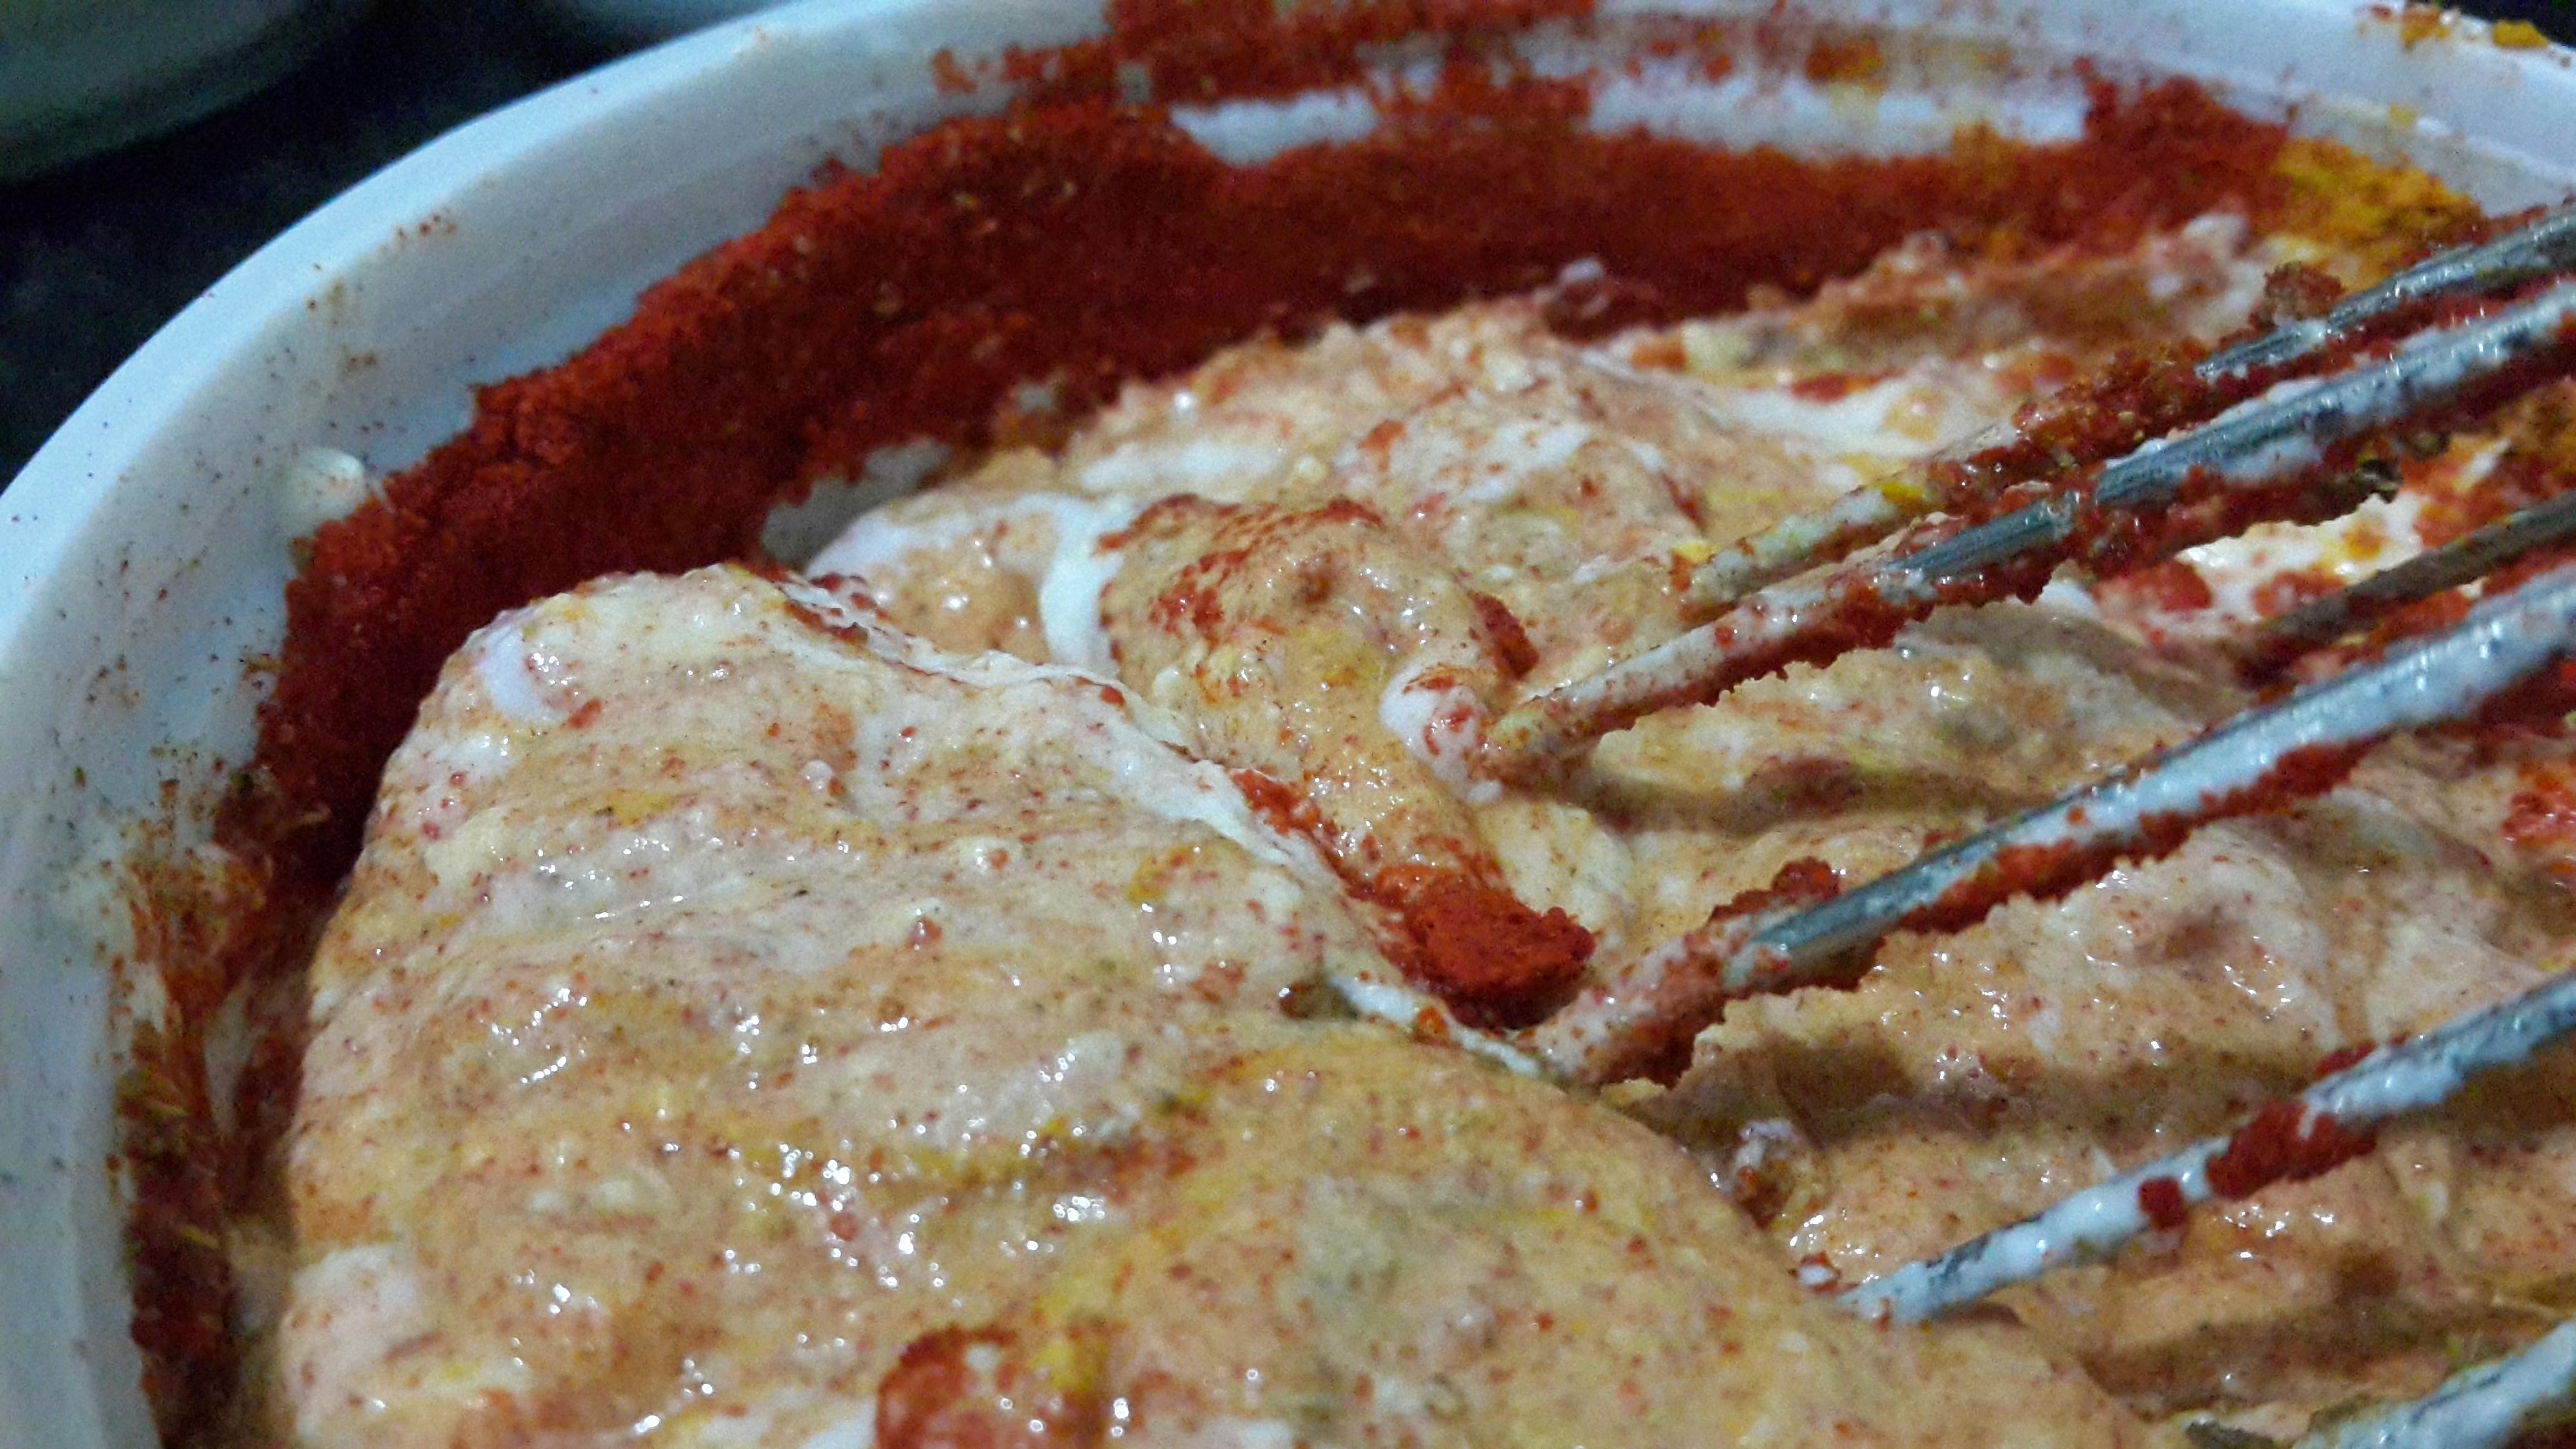 Curd whisked with red chilli powder, coriander powder, cumin powder and salt